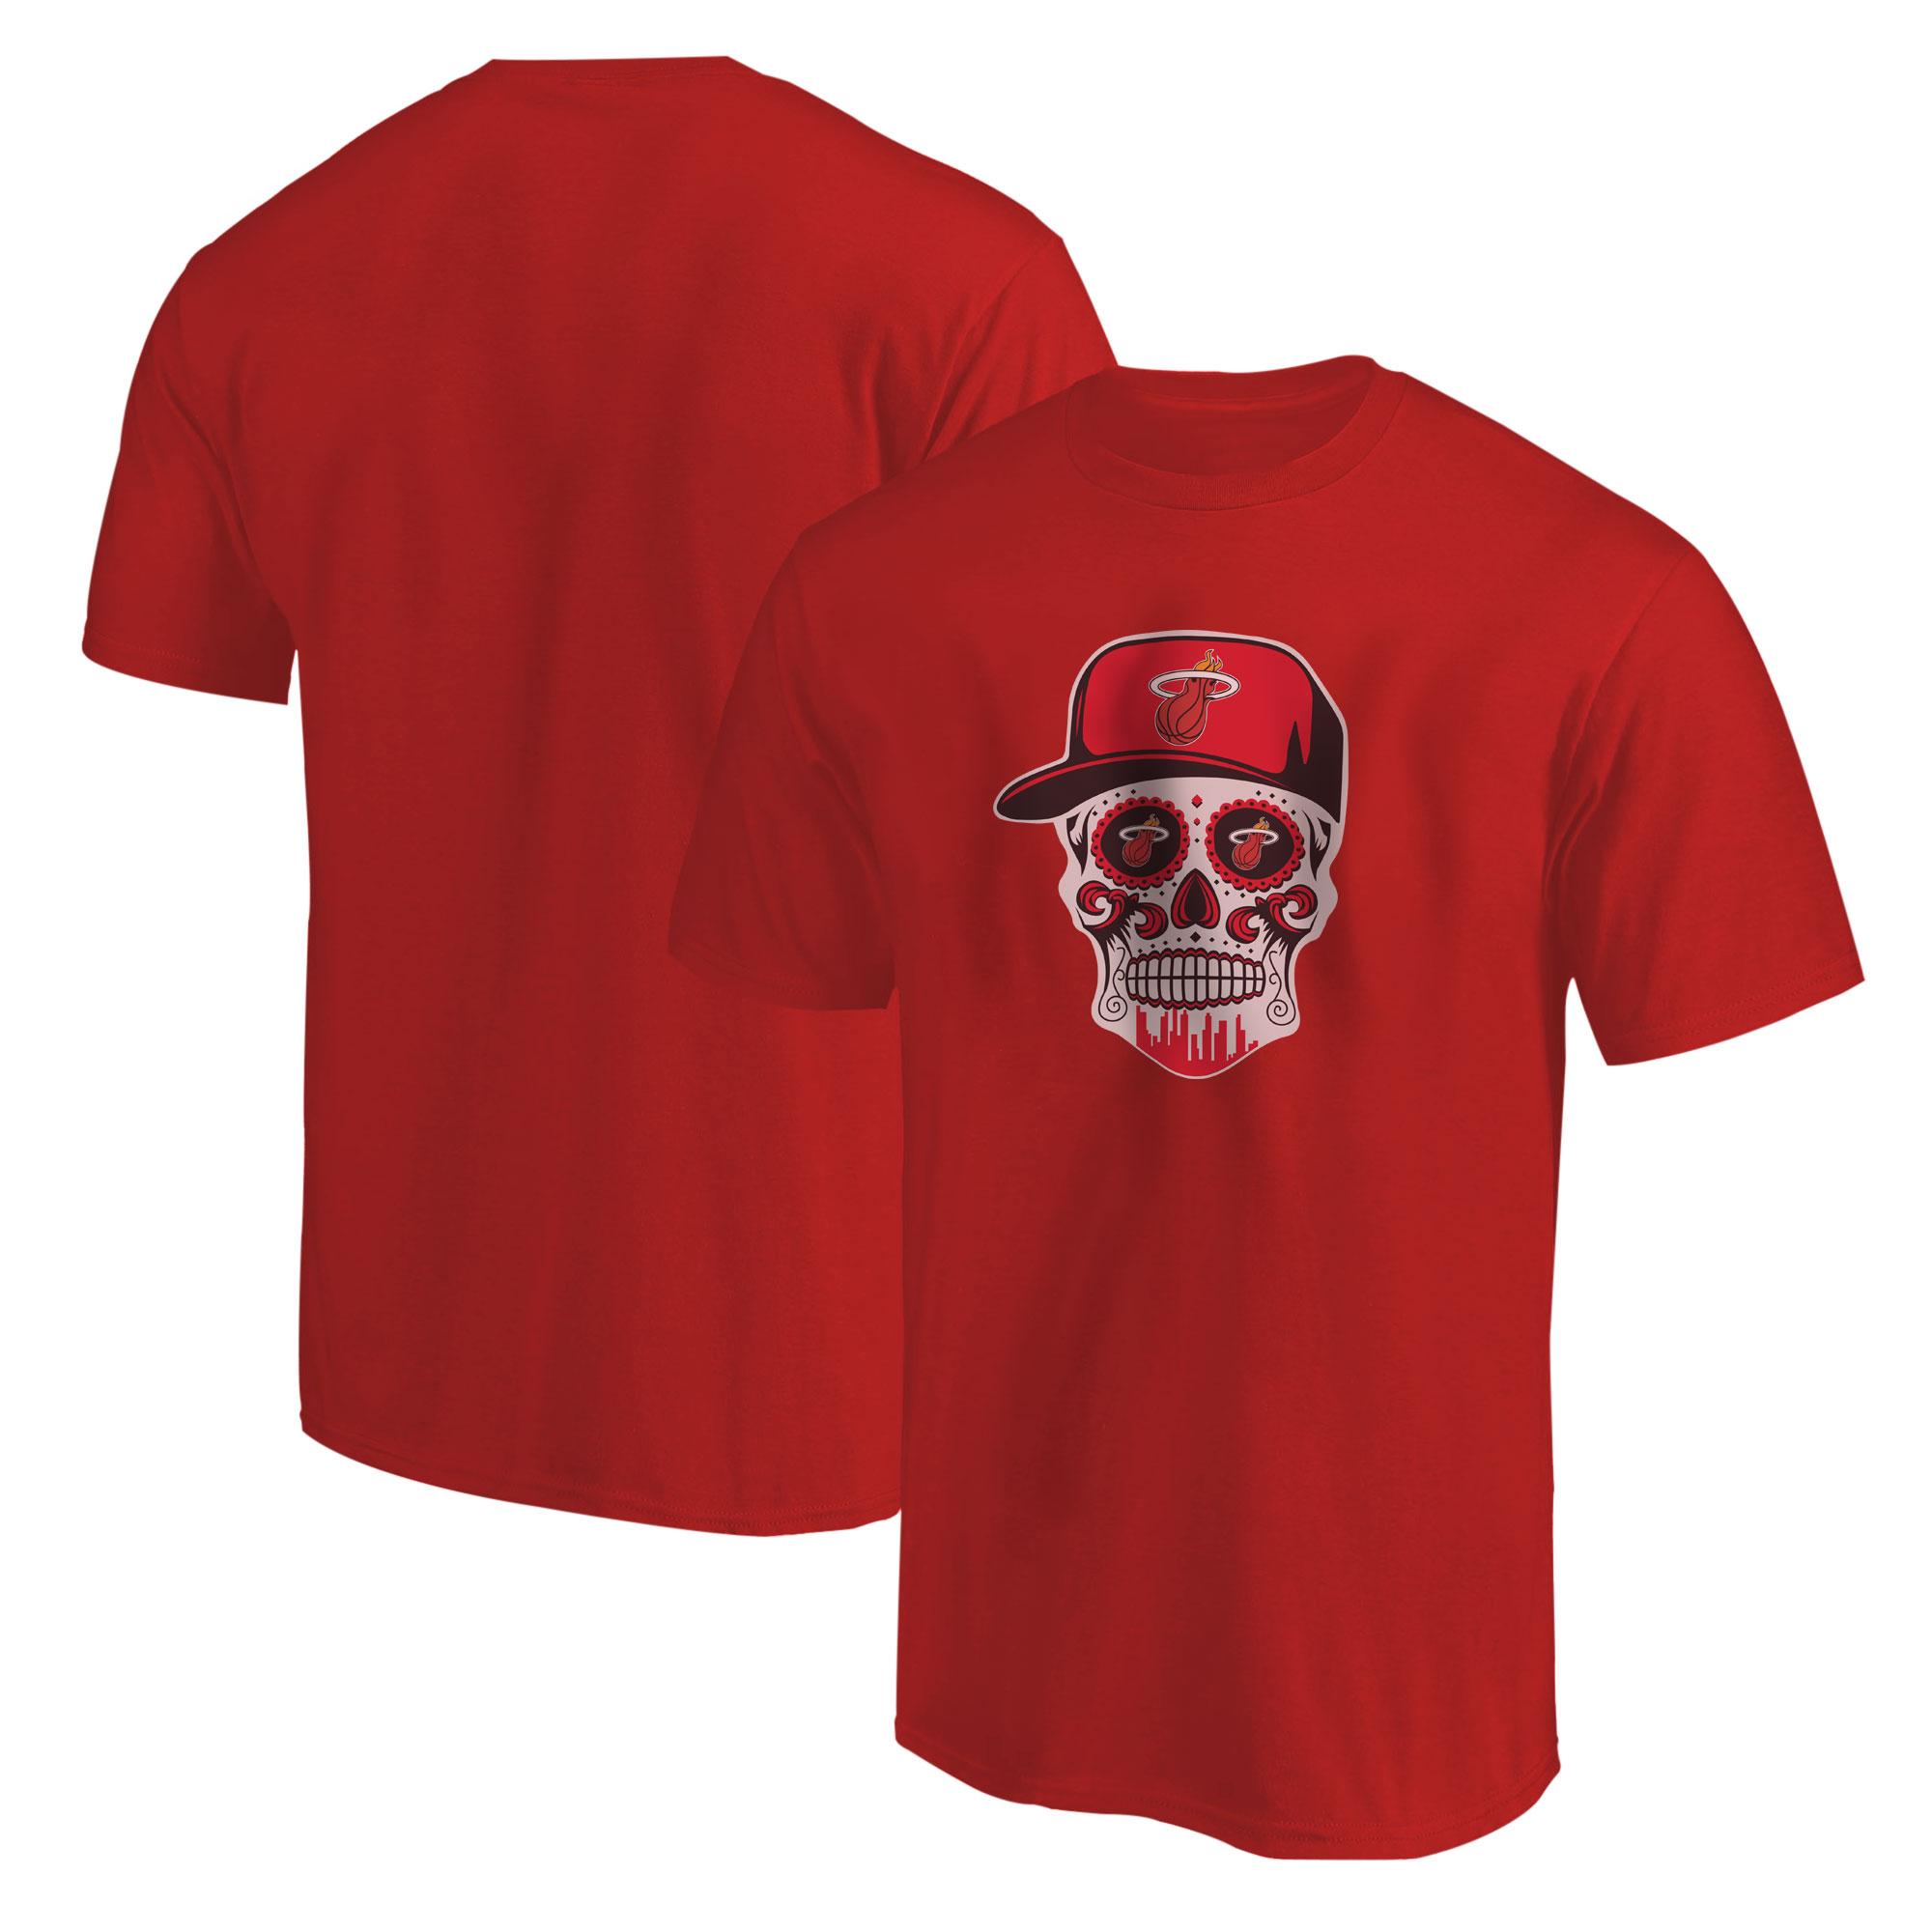 Heat Skull Tshirt  (TSH-RED-NP-456-NBA-MIAMI-SKULL)